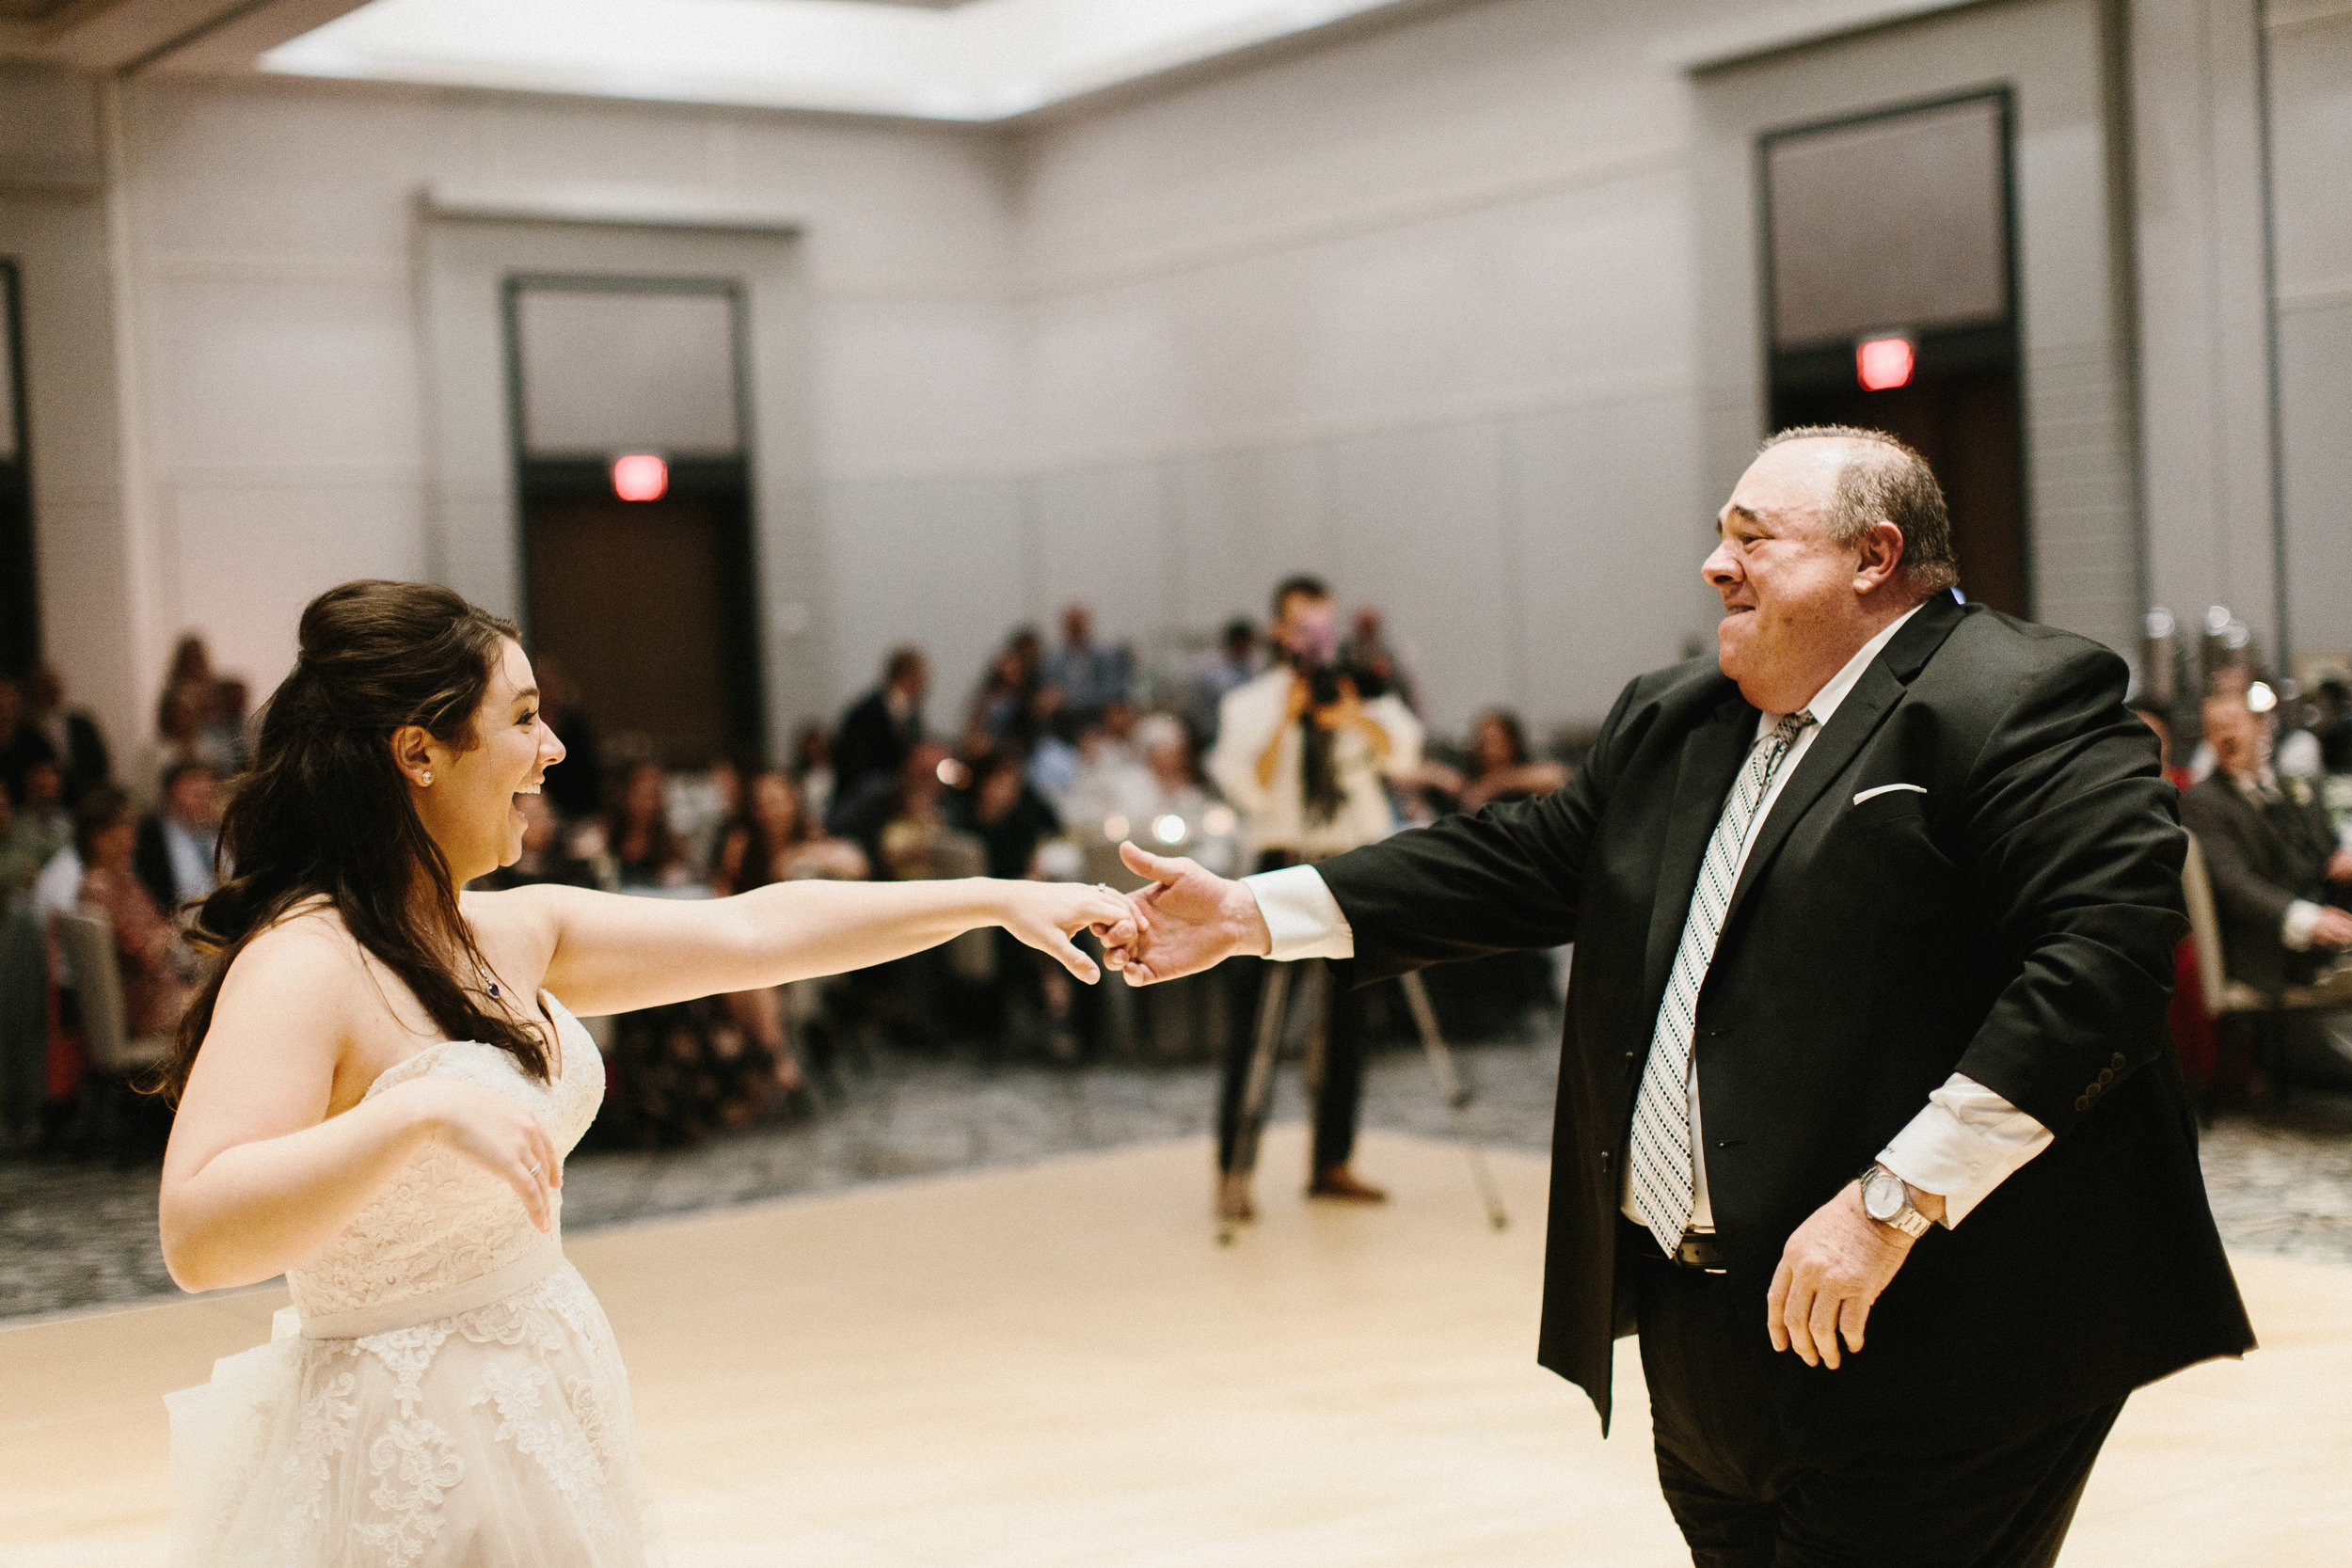 roswell_st_peter_chanel_catholic_avalon_hotel_alpharetta_wedding-2156.jpg